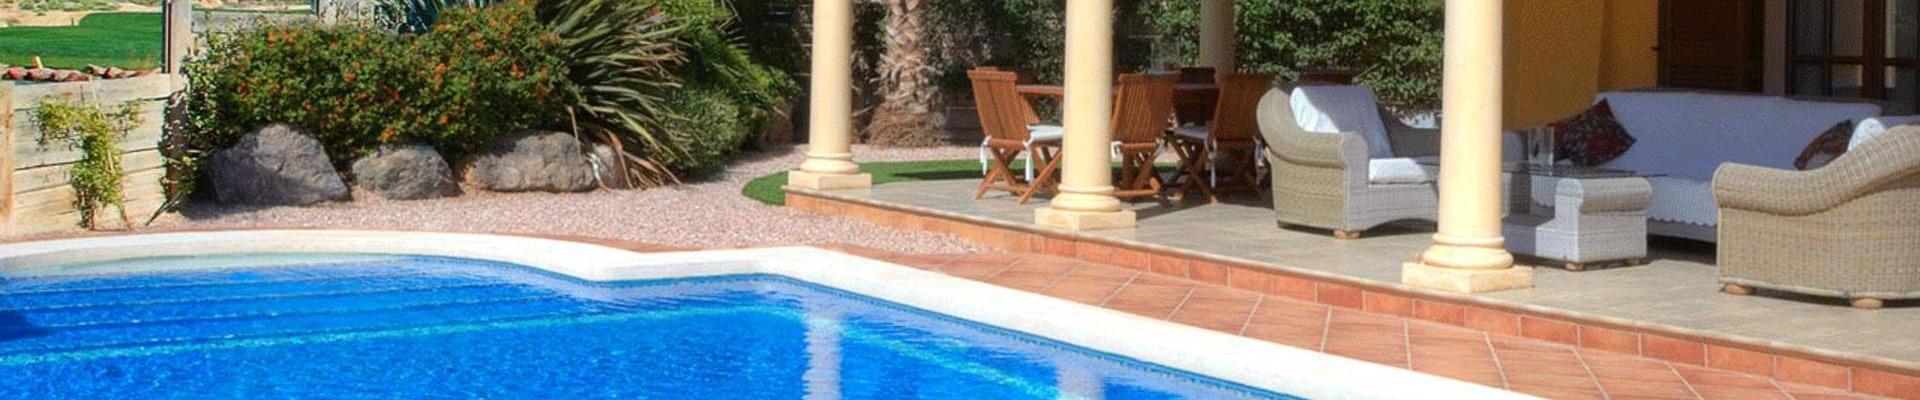 A Desert Springs villa